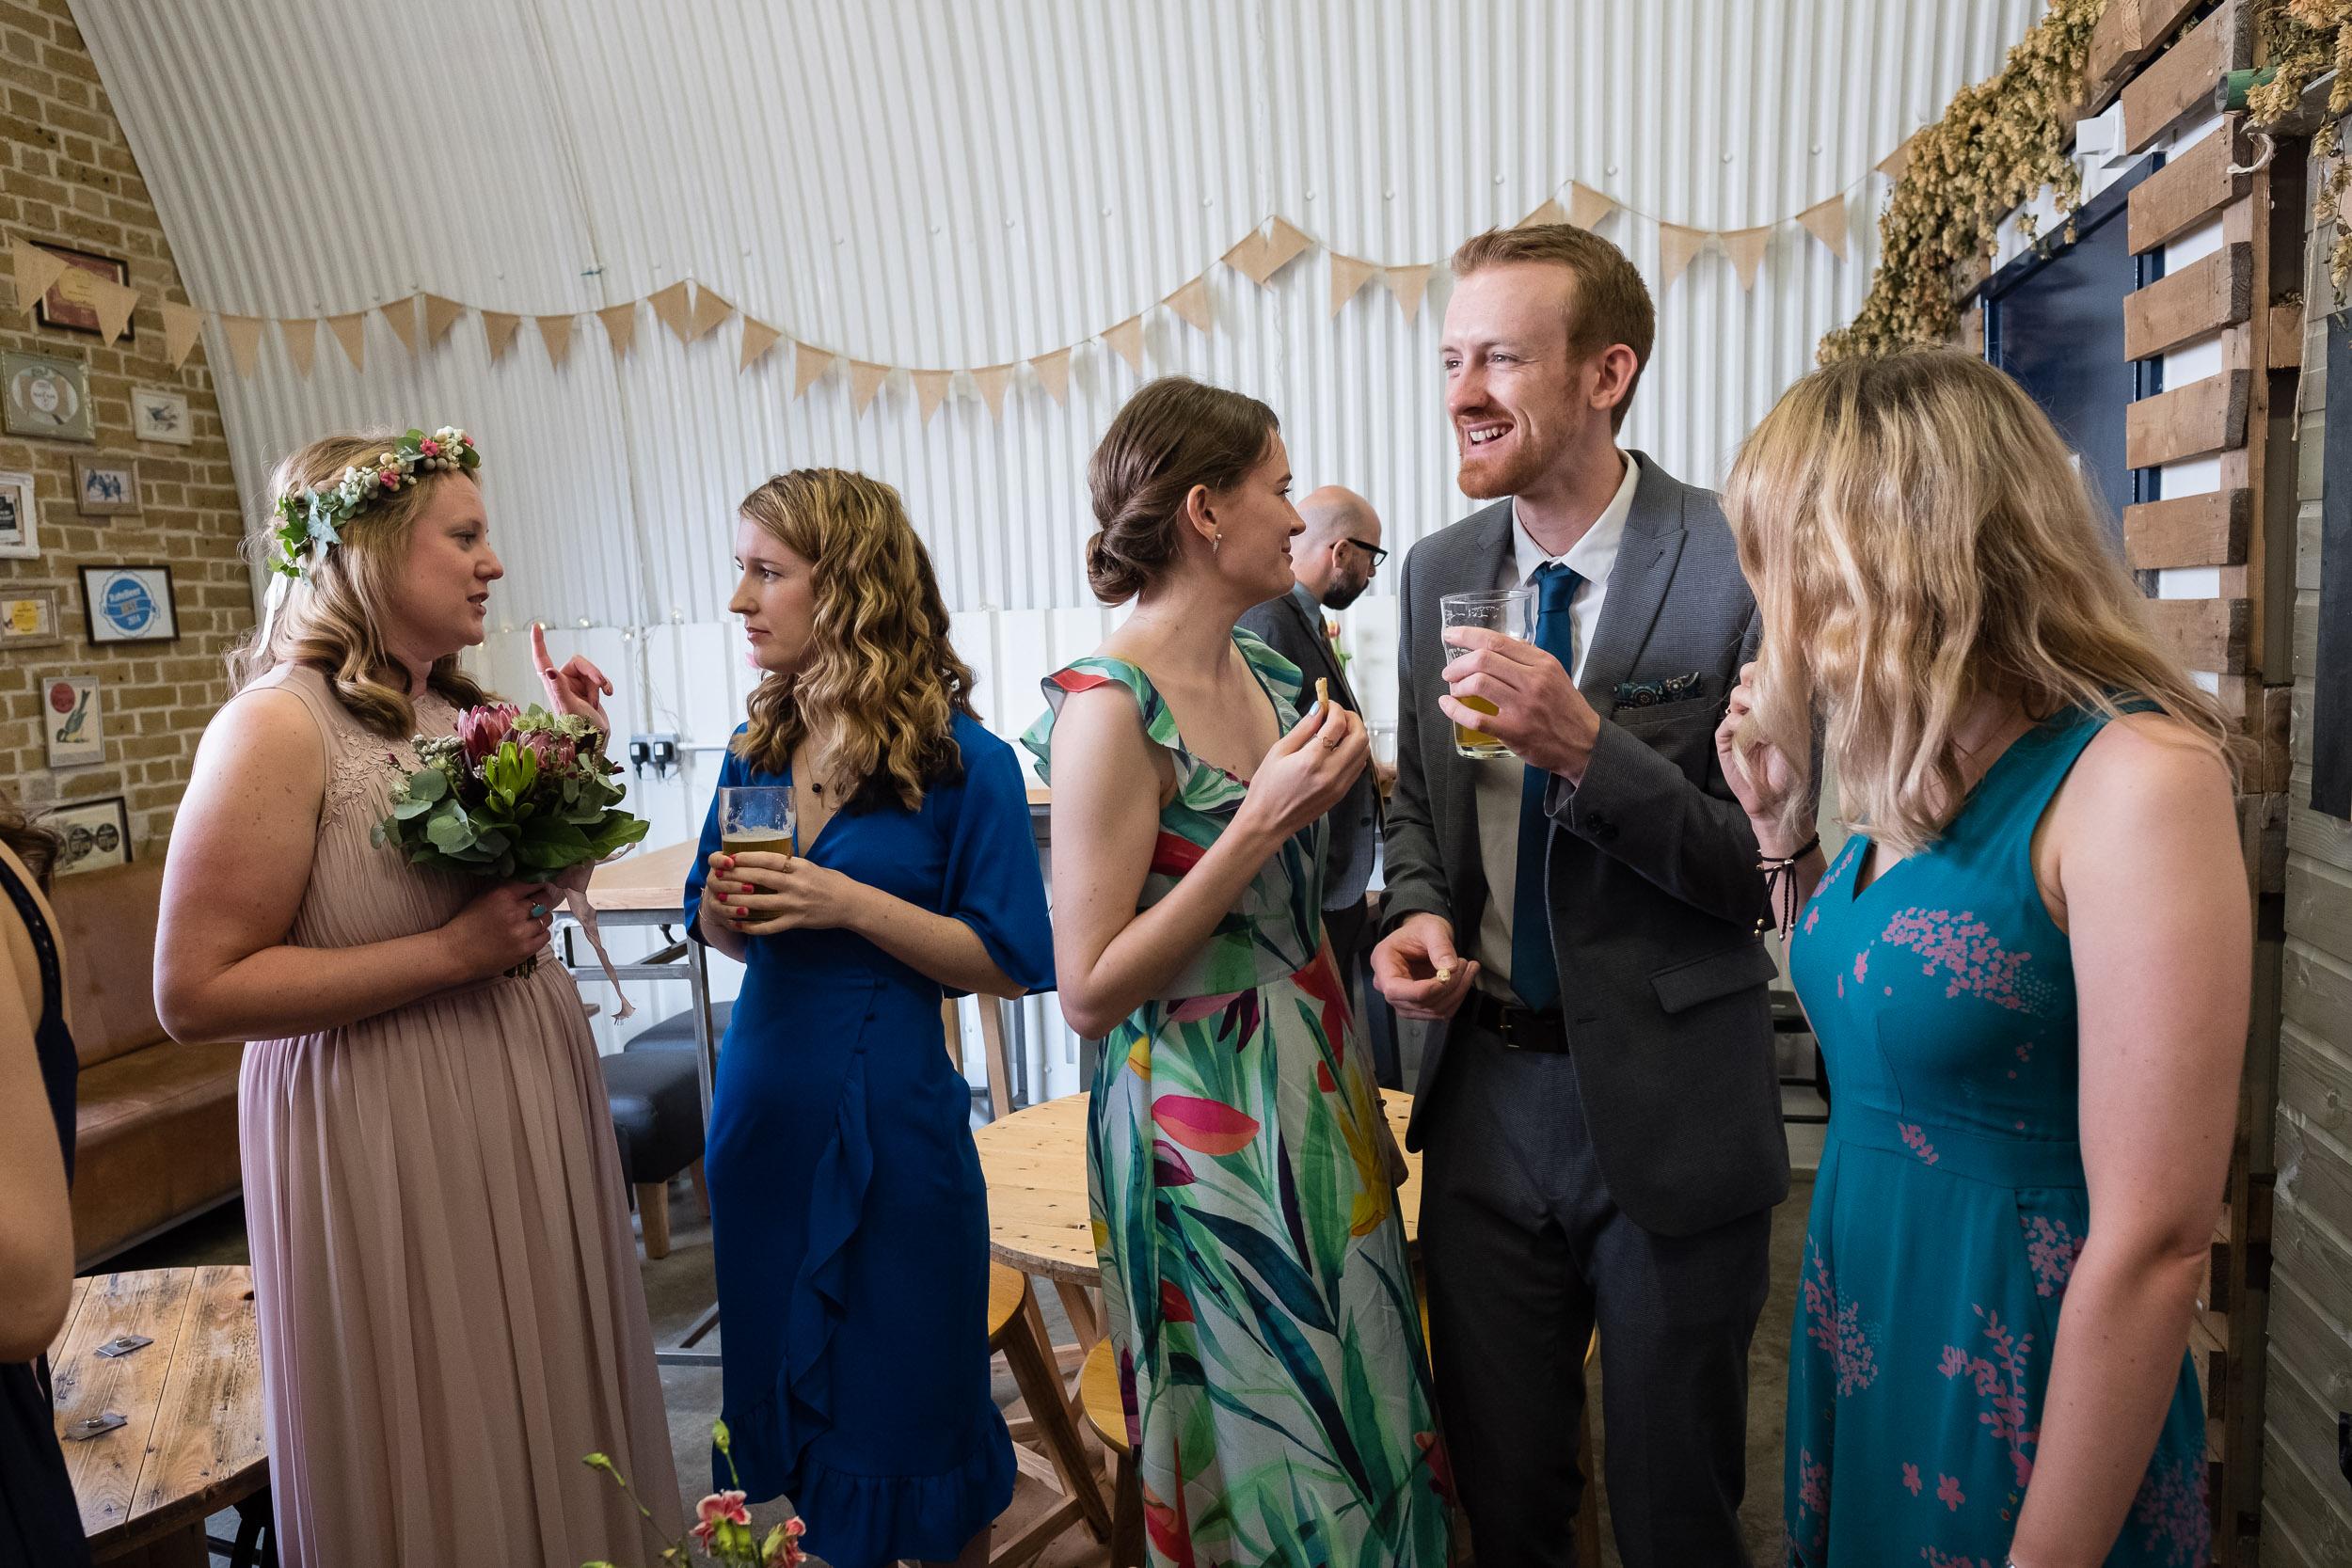 brockwell-lido-brixton-herne-hill-wedding-082.jpg